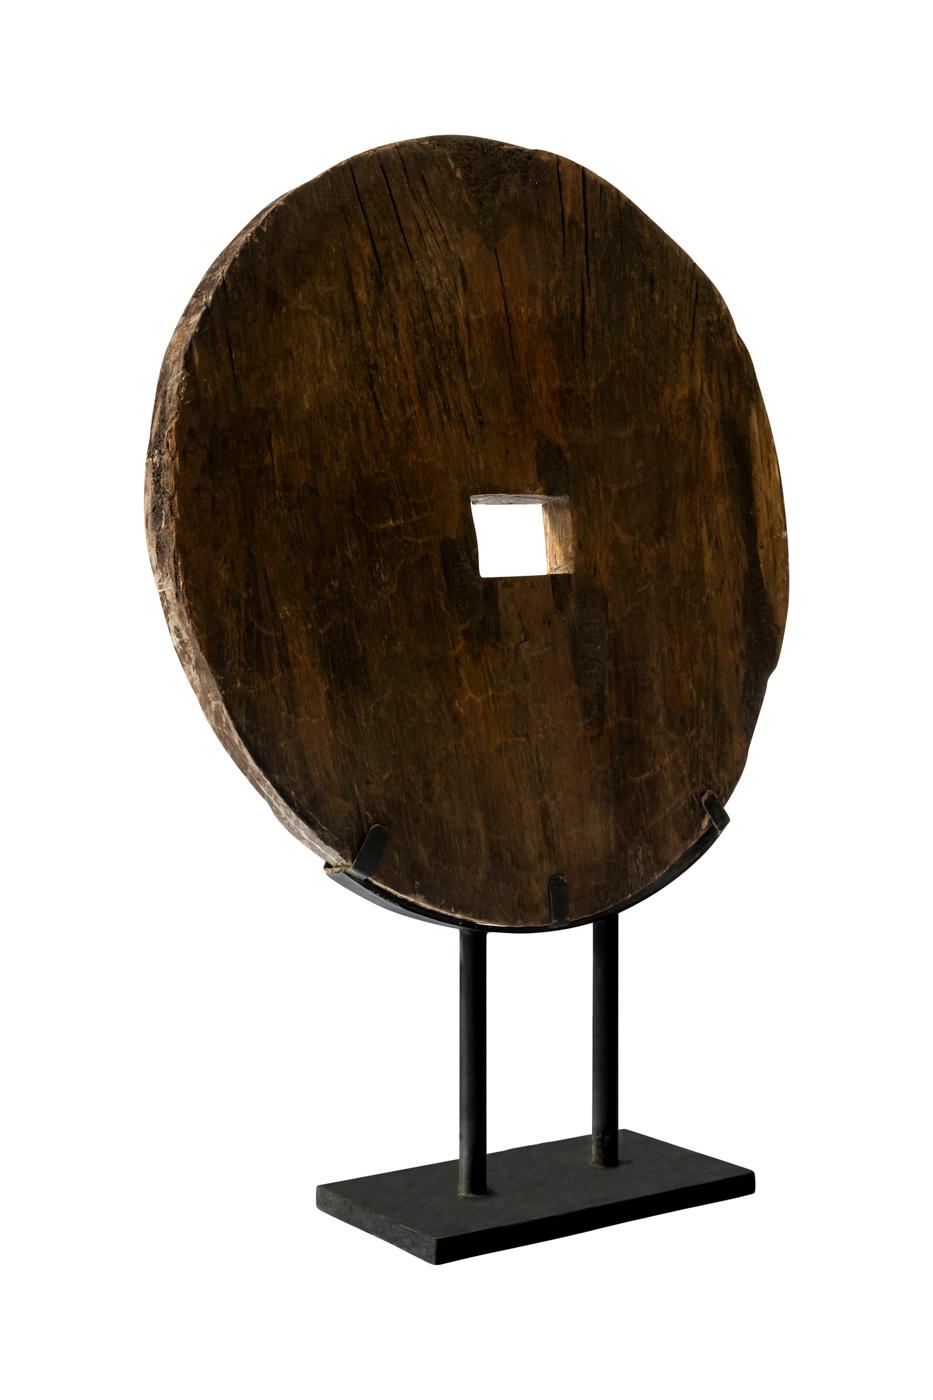 Rueda decorativa en madera sobre base de metal-Caoba oscuro